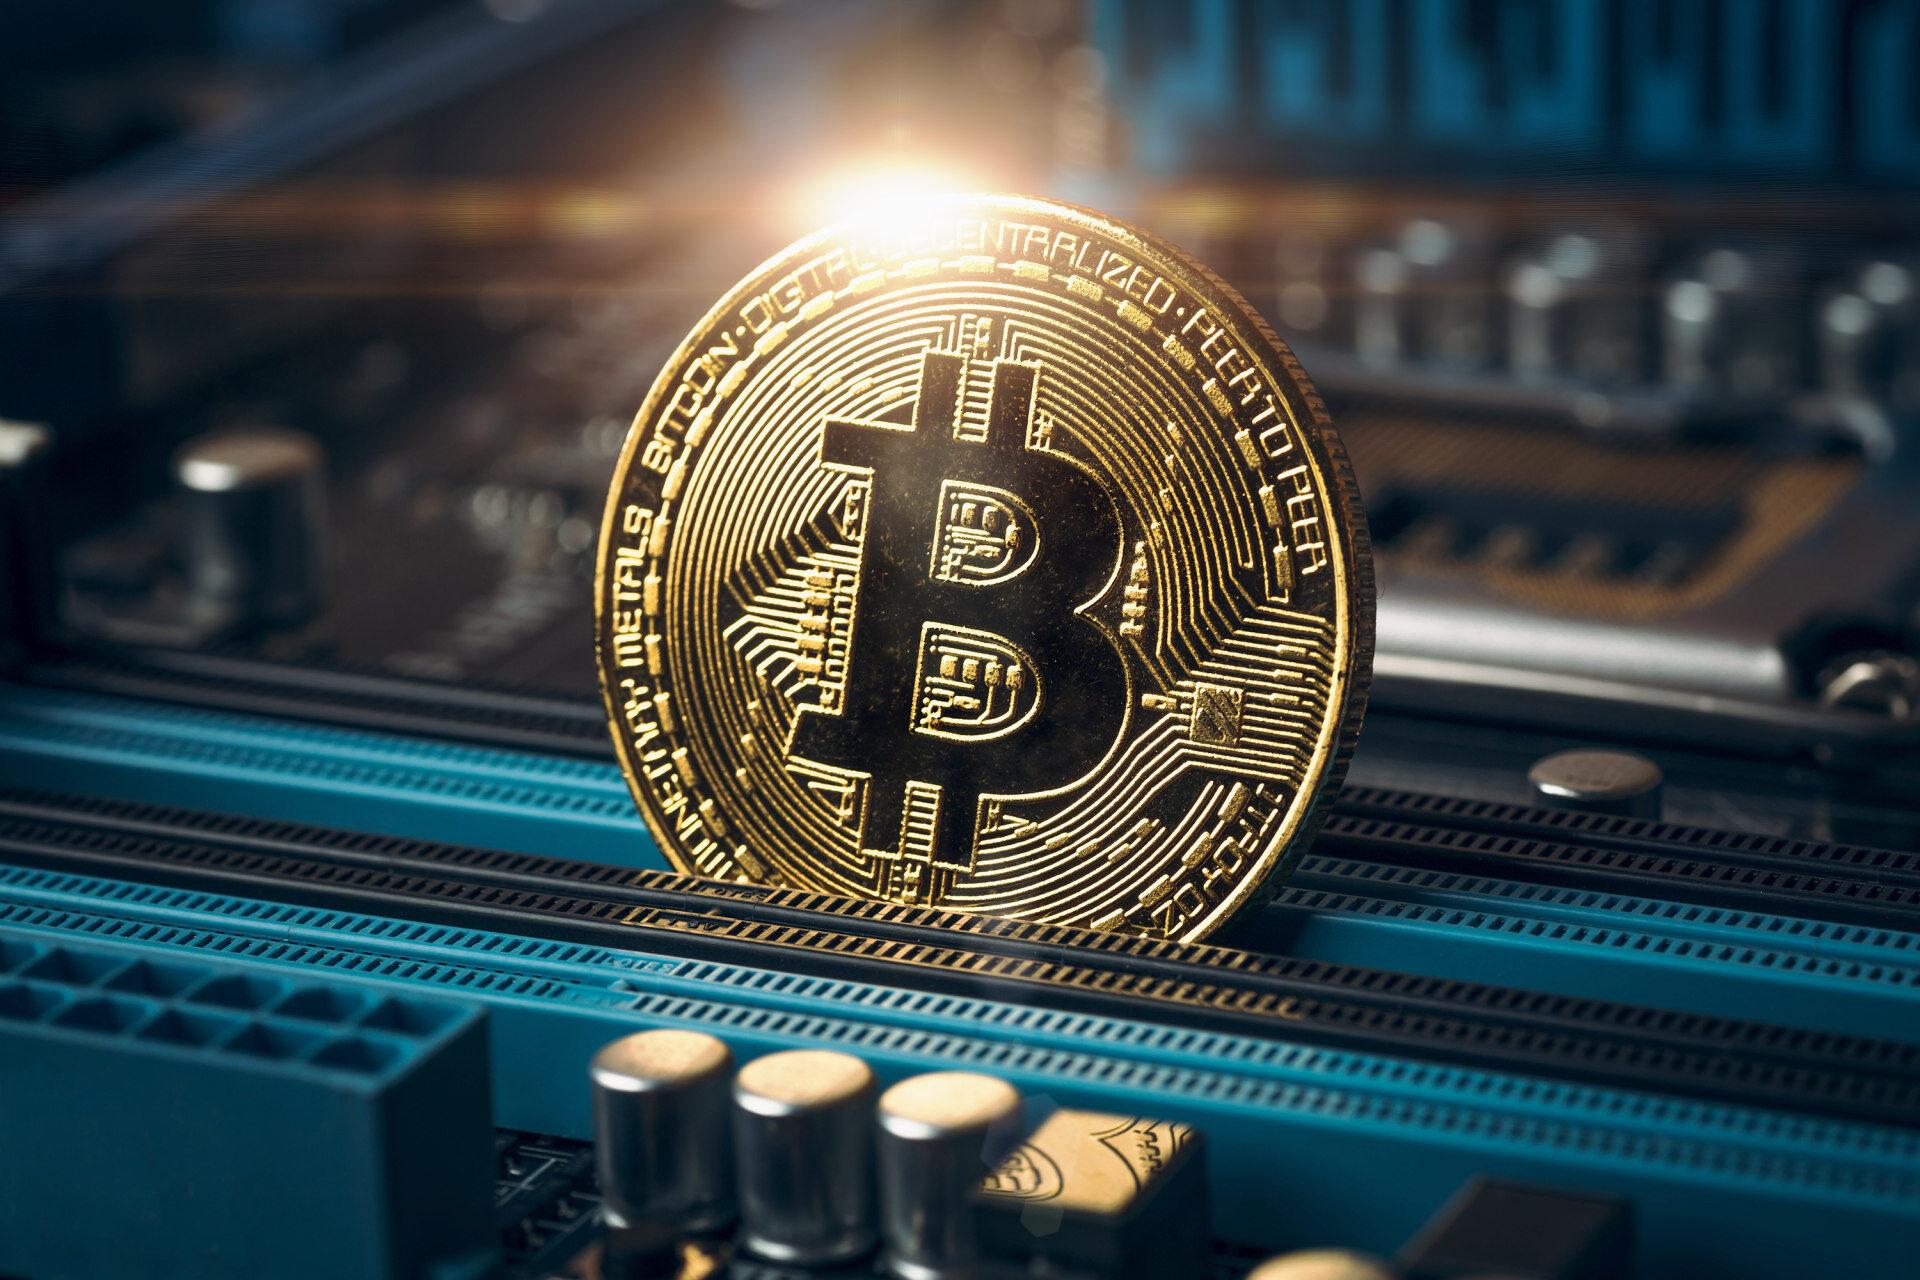 Laagste waarde bitcoins epsom oaks 2021 betting advice